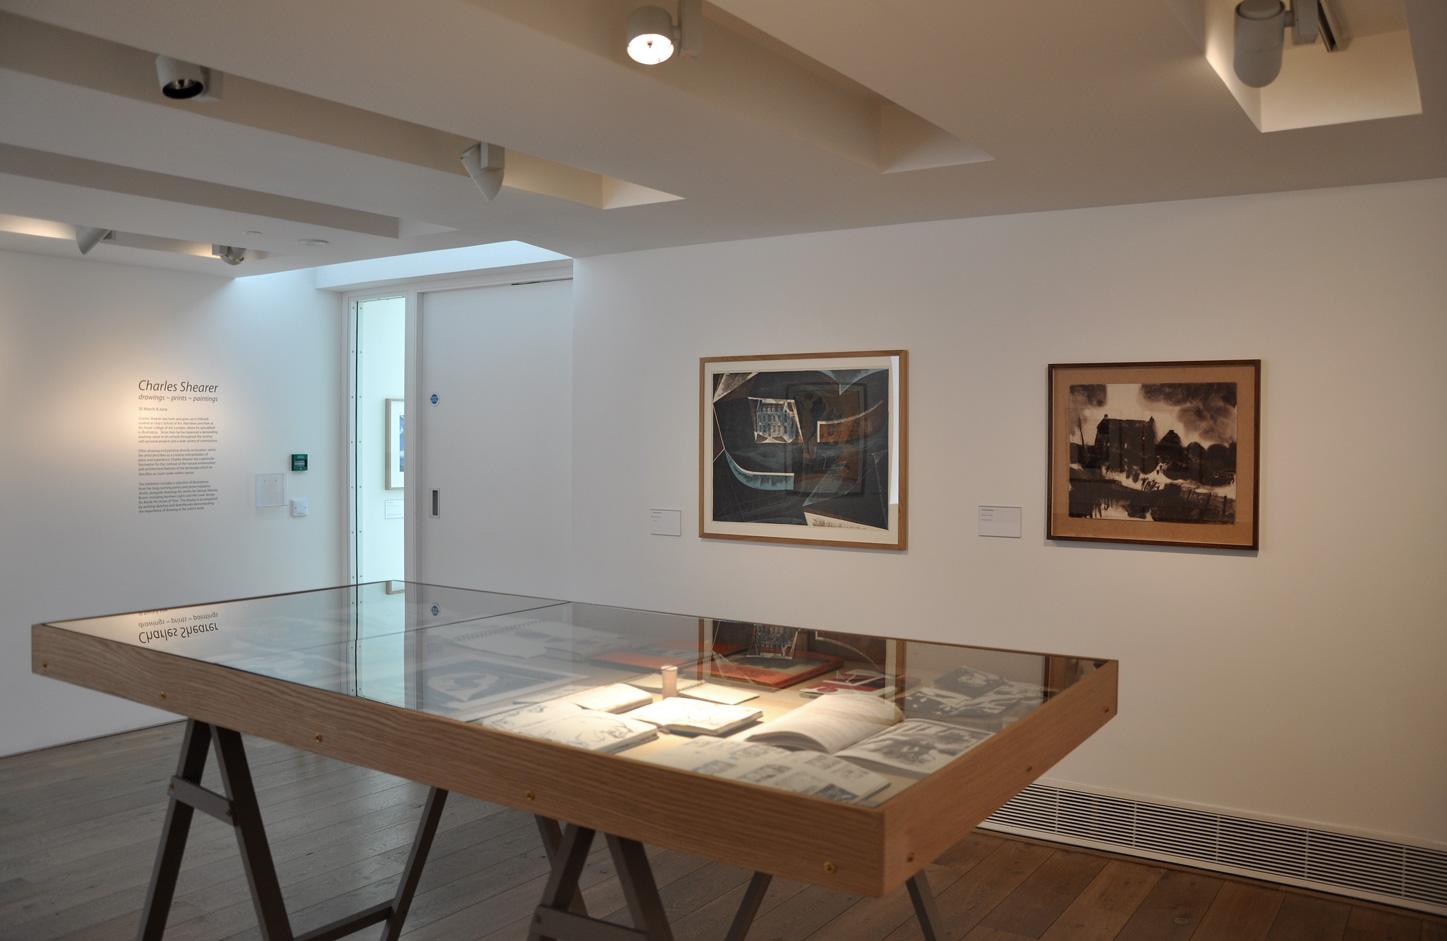 shearer-gallery-three-6.jpg